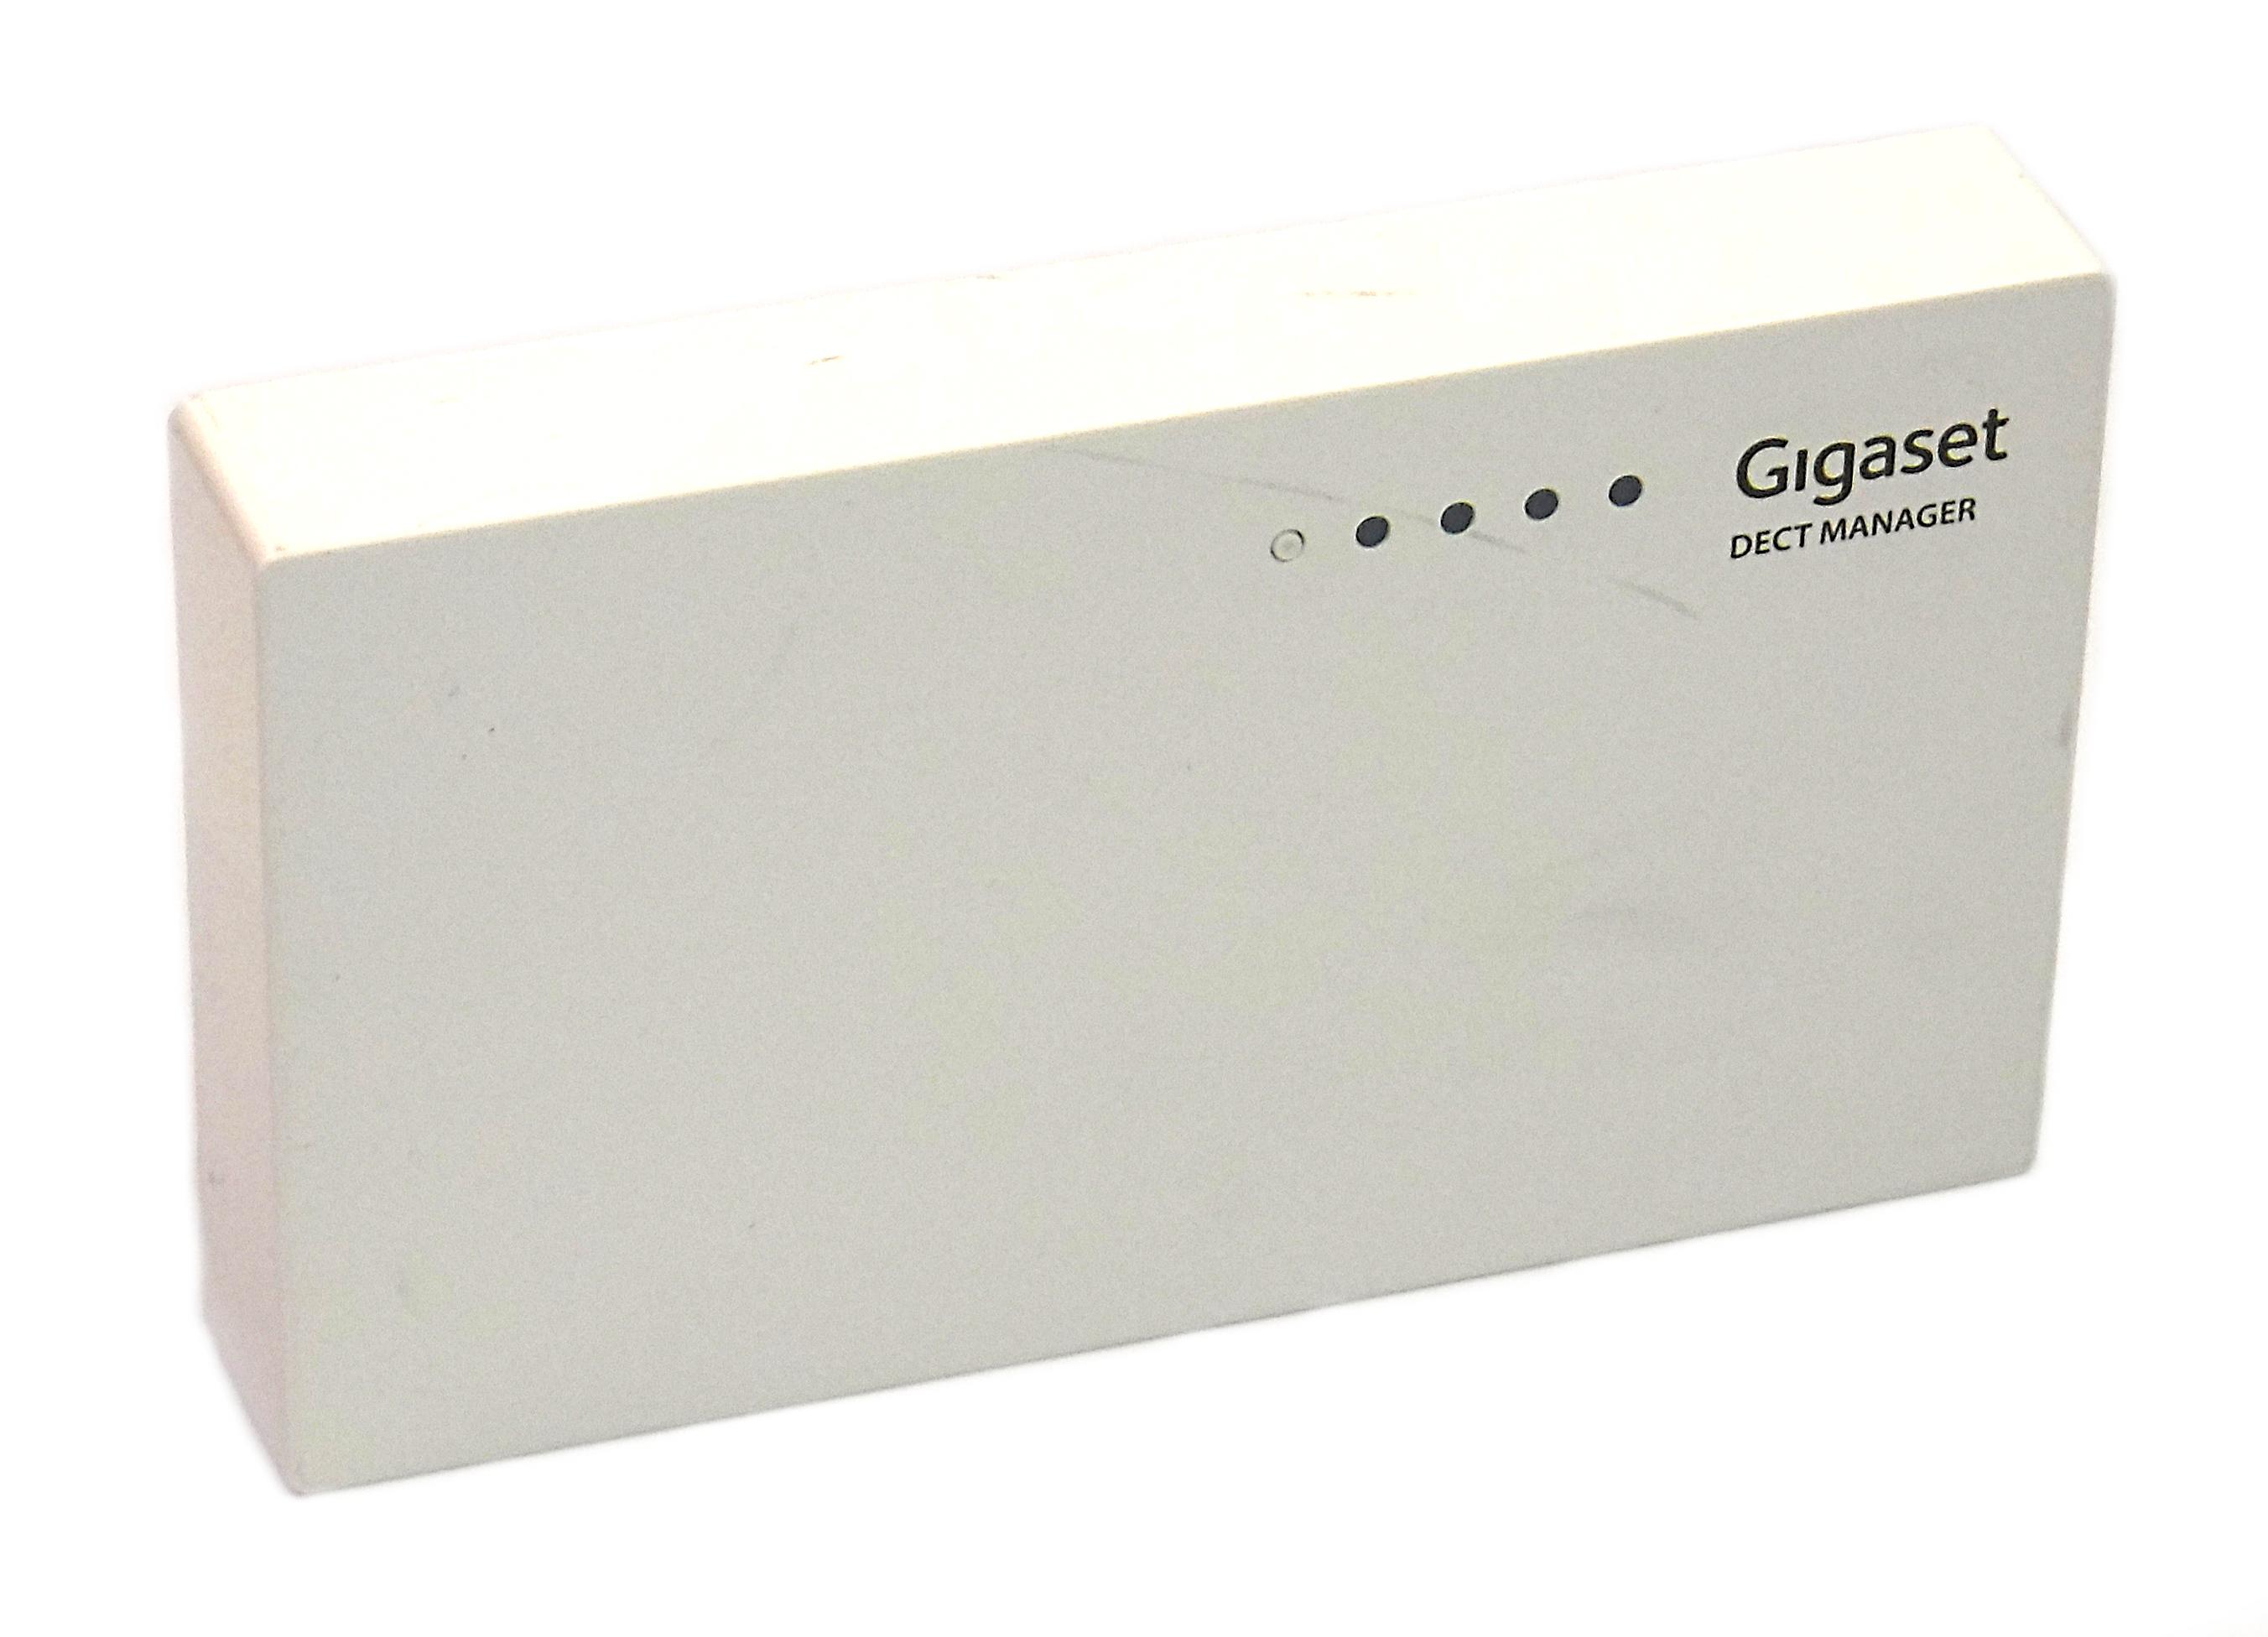 Gigaset N720 DM PRO S30852-S2315-R101-X DECT Manager